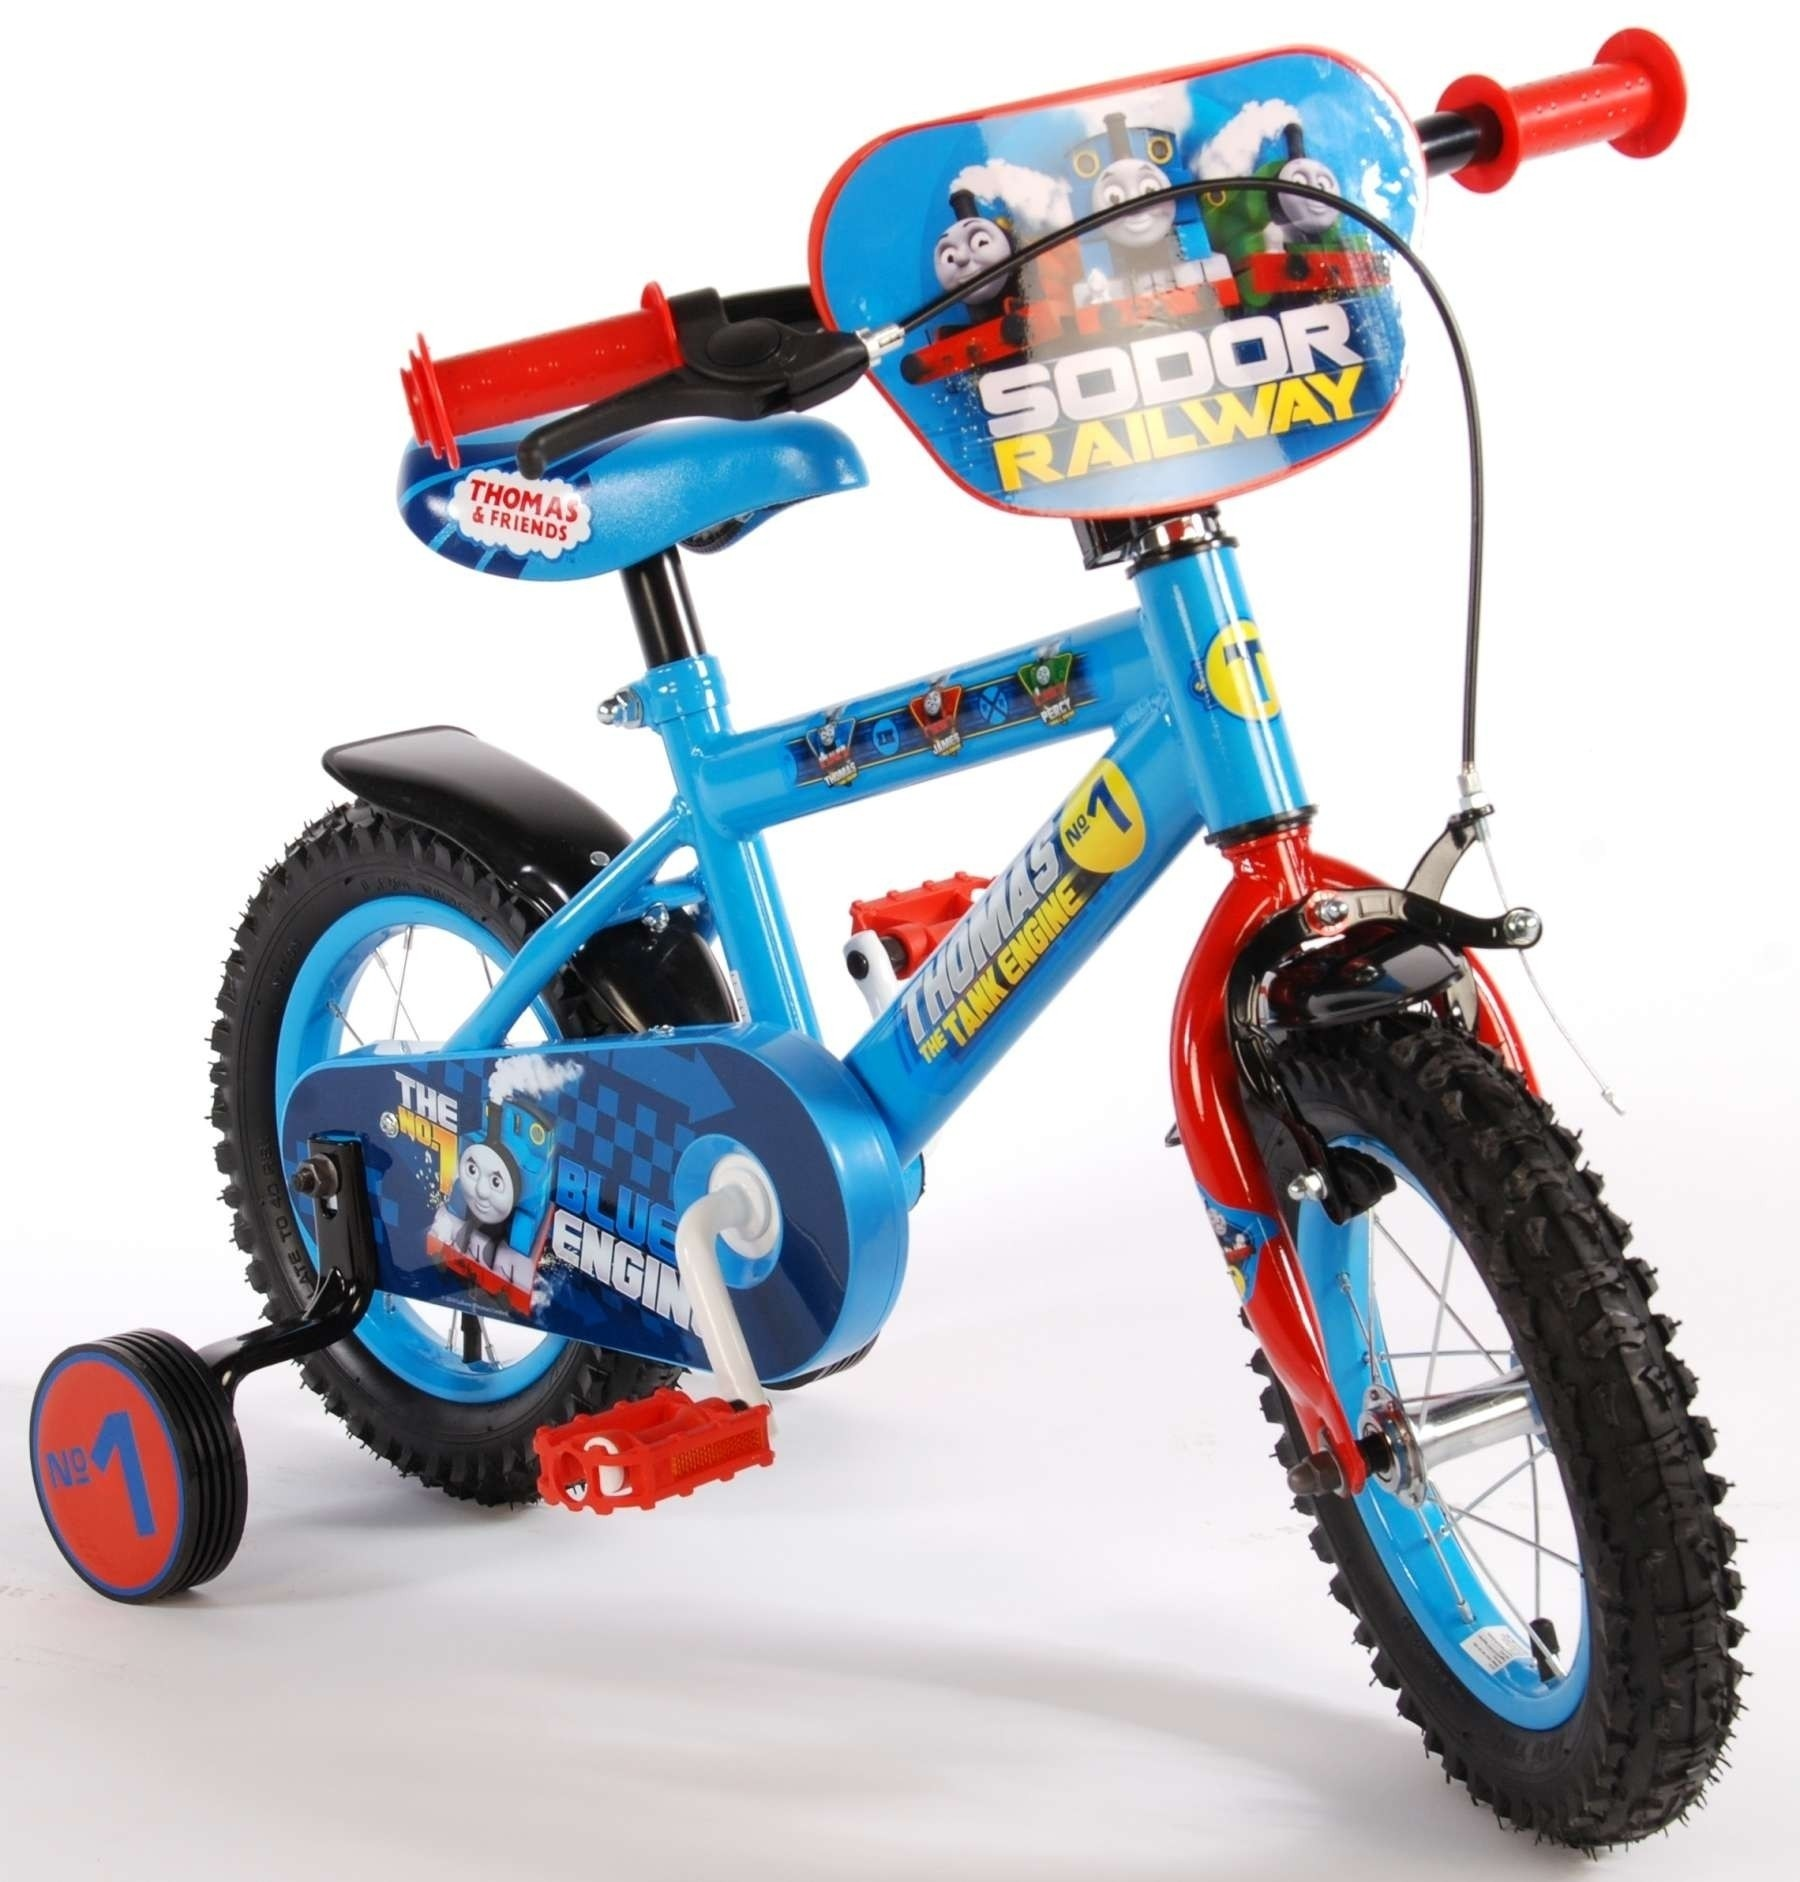 Thombike blauw 12 inch jongensfiets 51286-CH